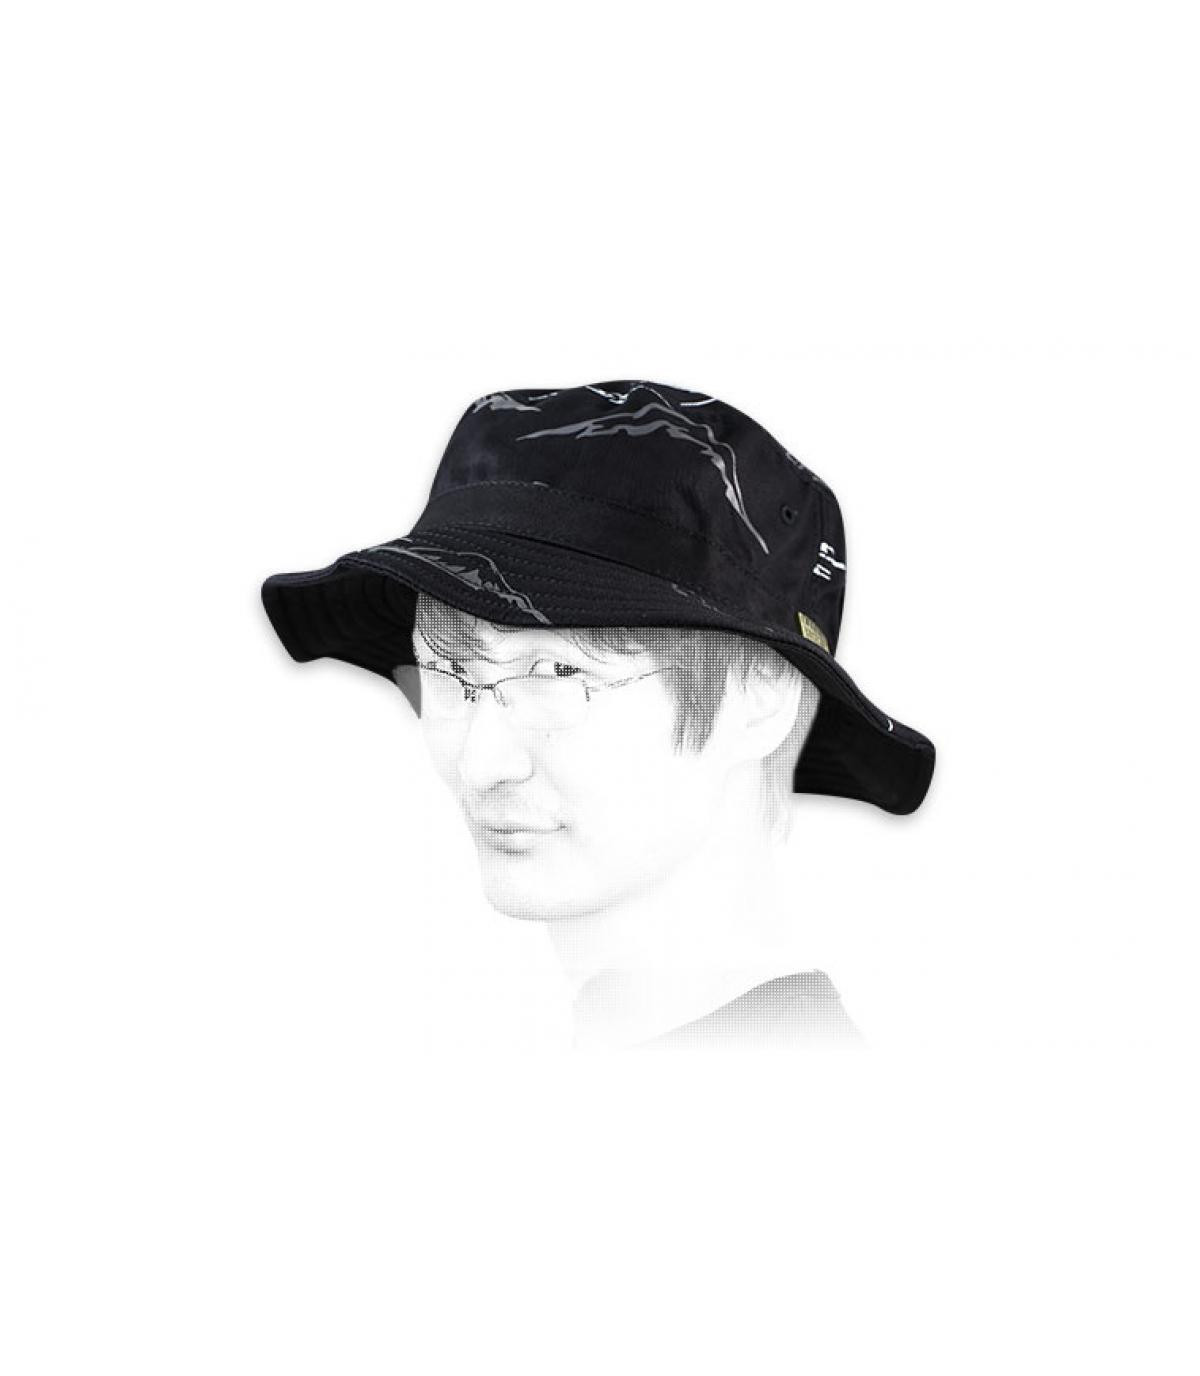 Rocksmith black bucket